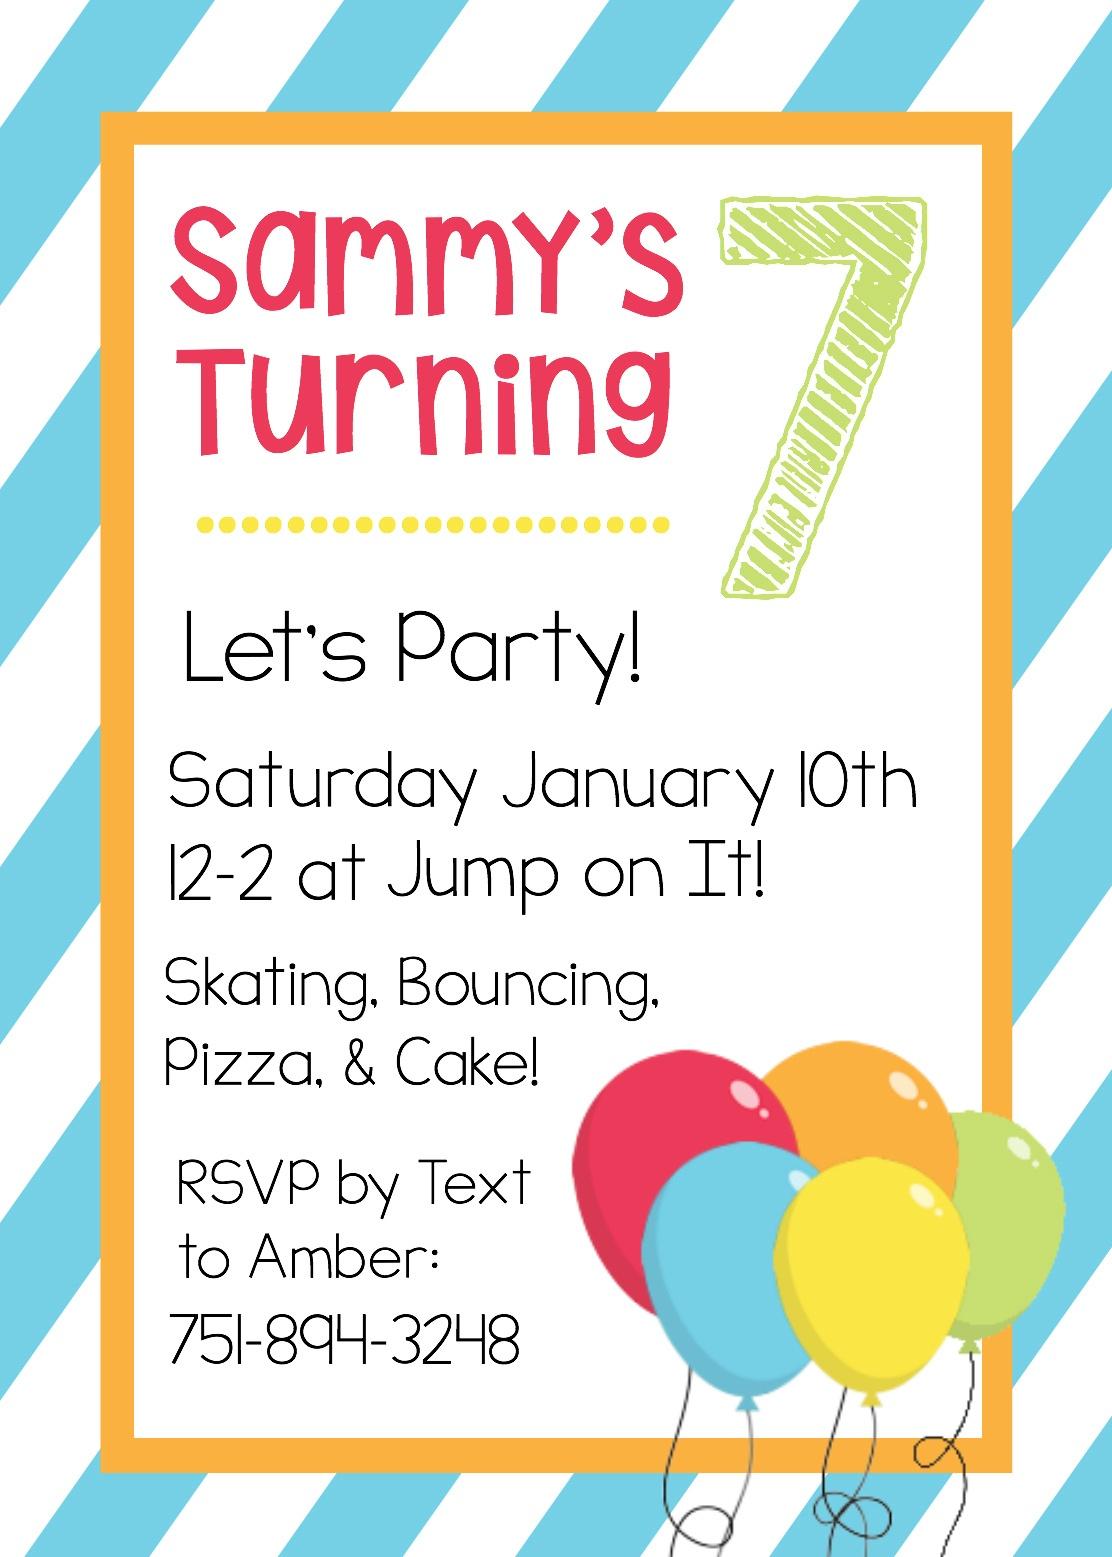 Free Printable Birthday Invitation Templates - Make Printable Party Invitations Online Free